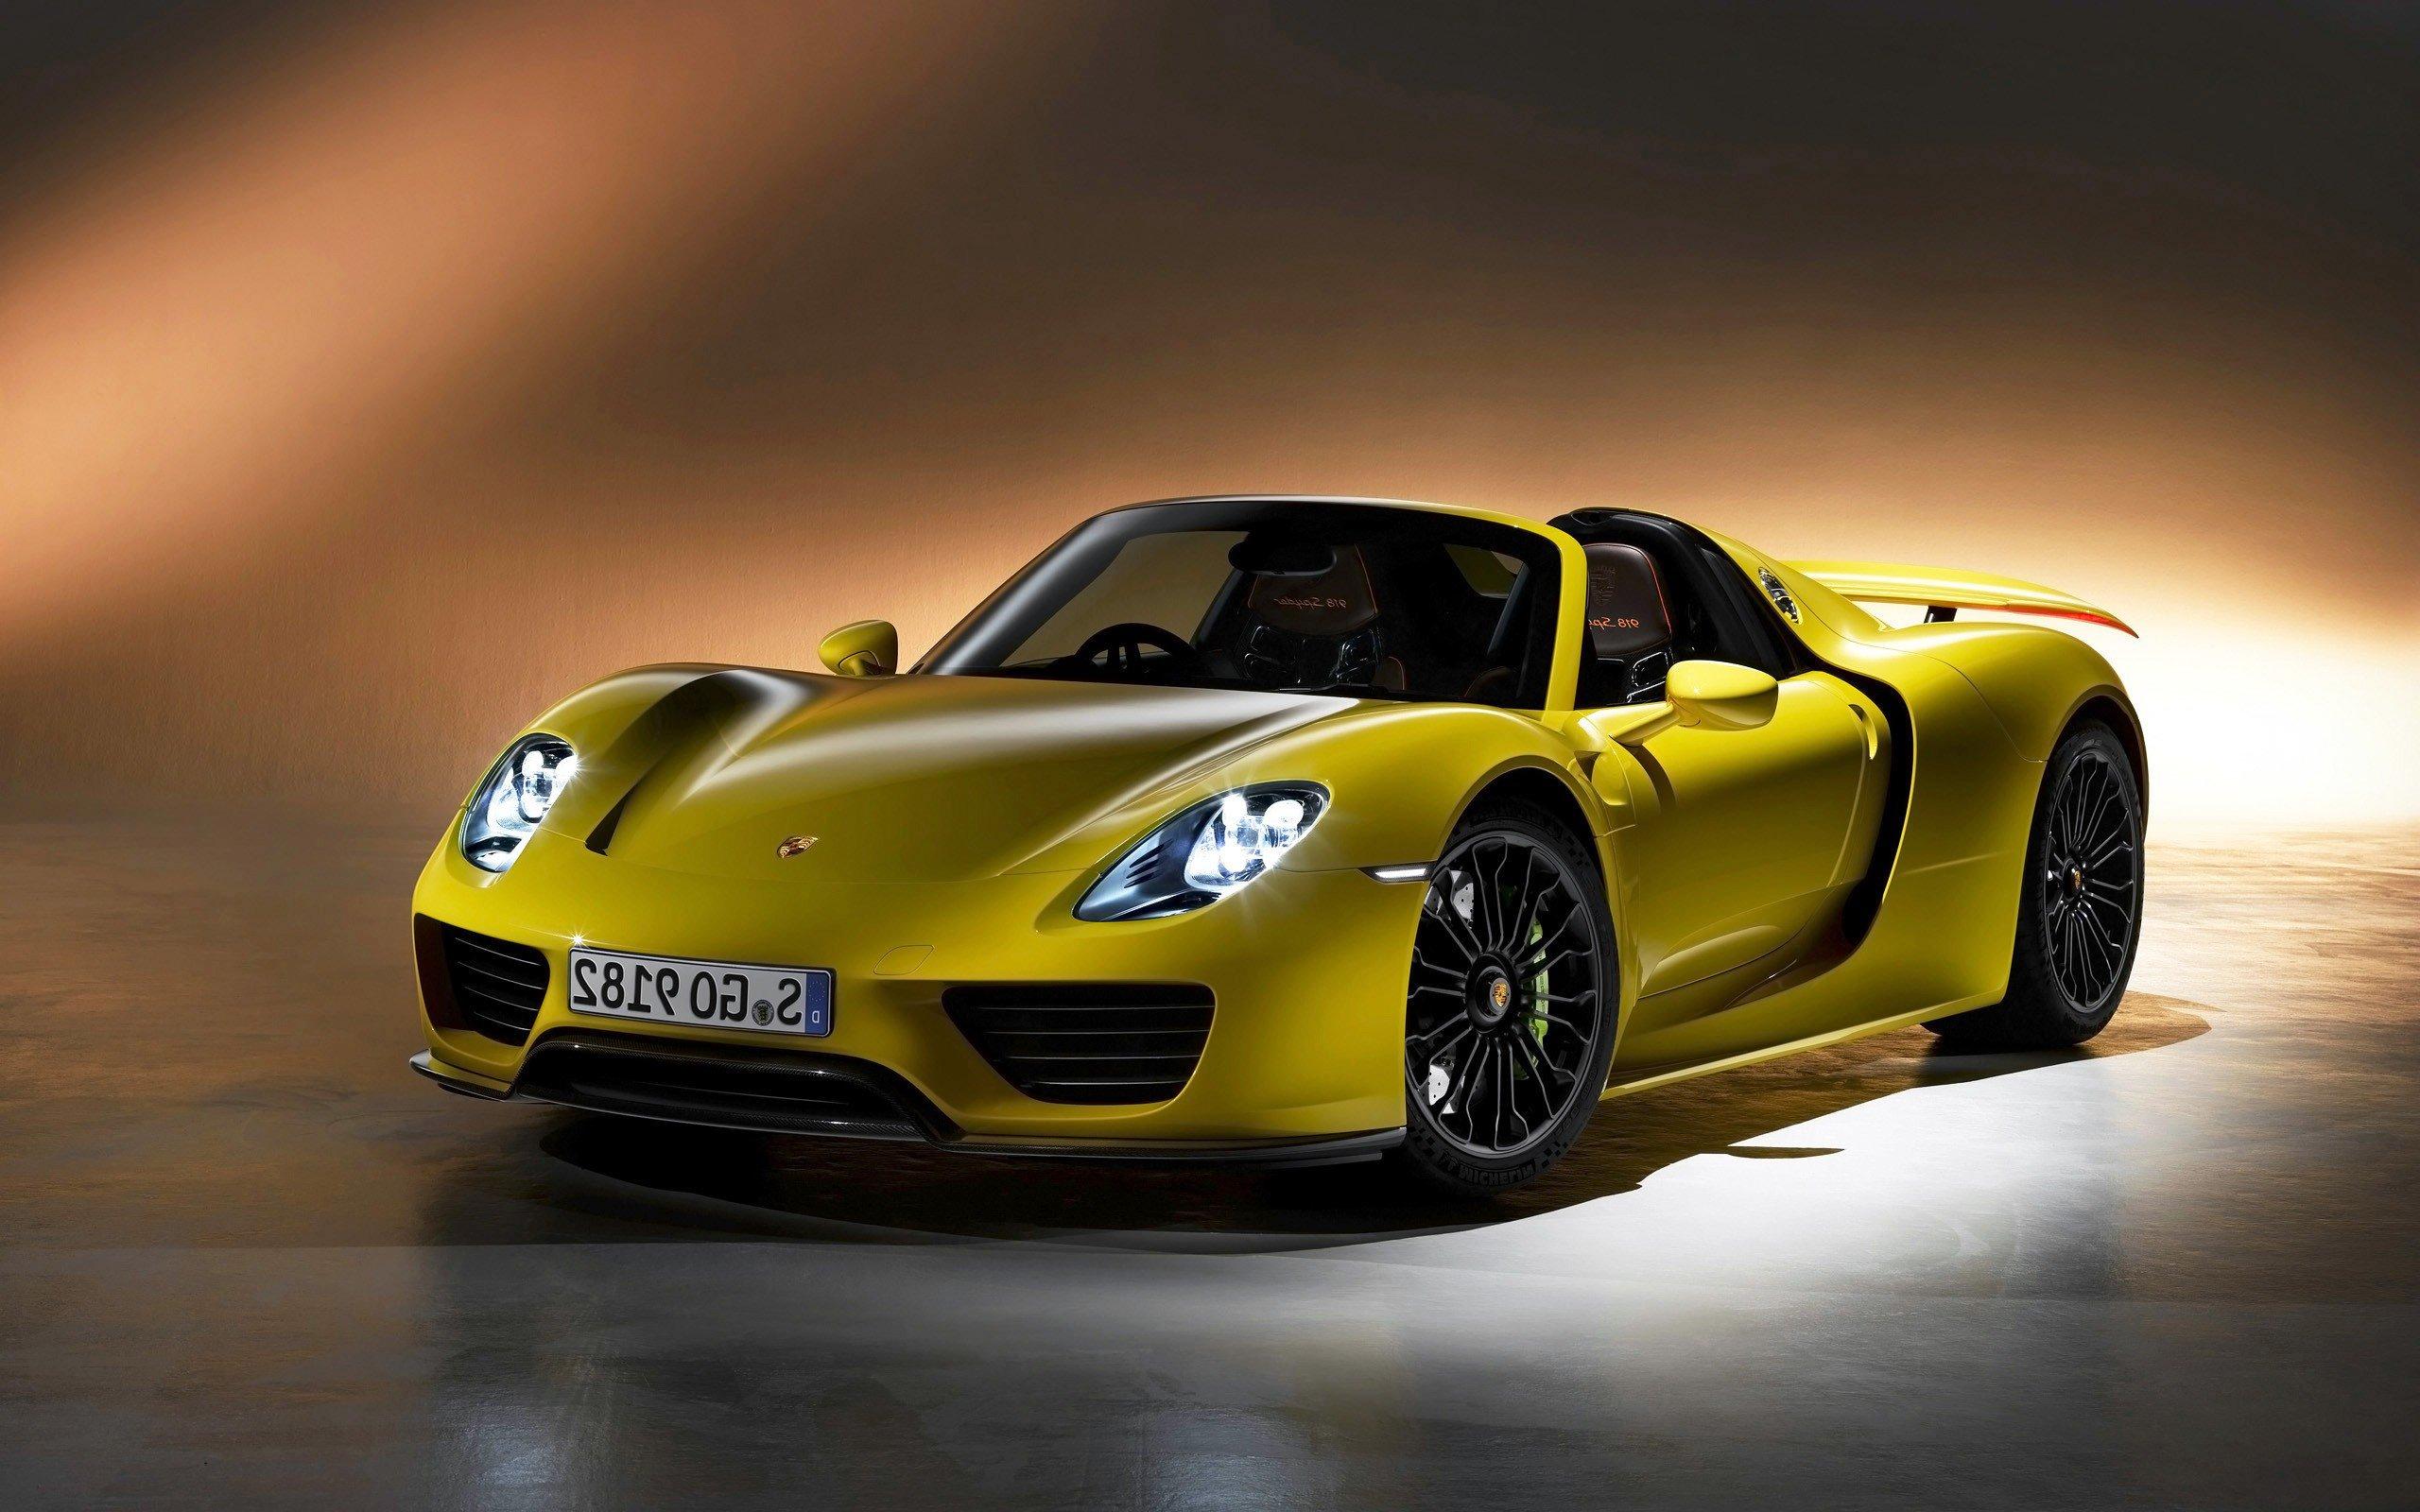 Porsche 918 Spyder Desktop Hd Cars 4k Wallpapers Images Backgrounds Photos And Pictures